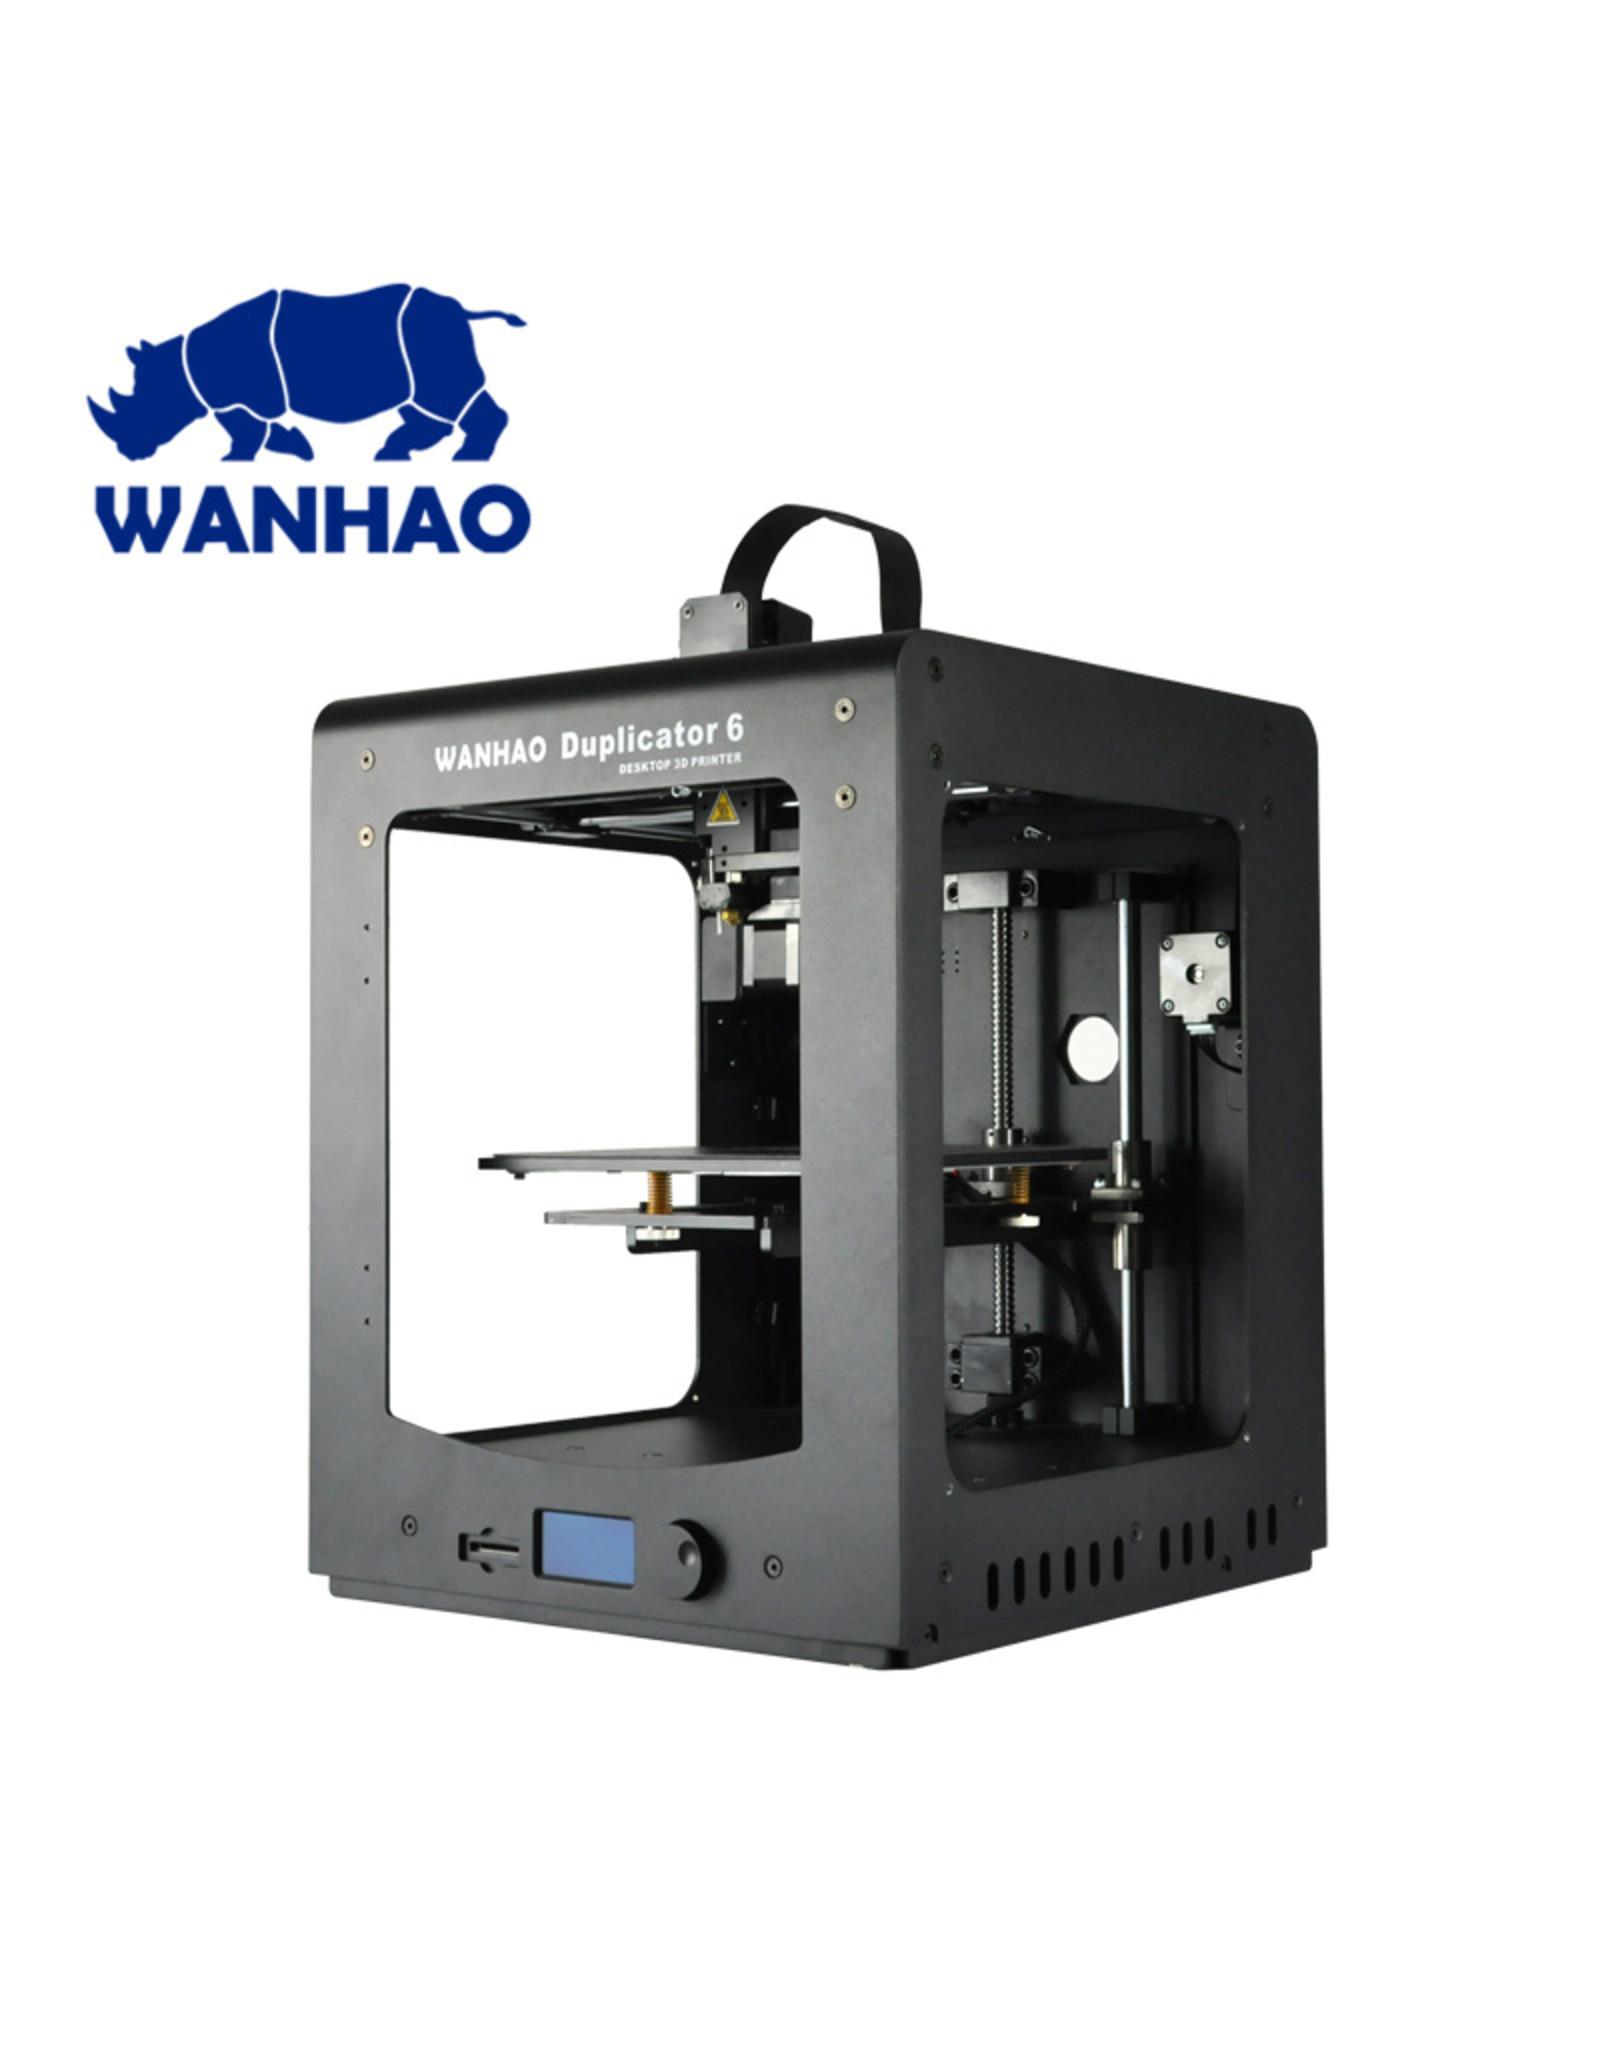 Wanhao  Wanhao Duplicator 6 Plus - Remis à neuf